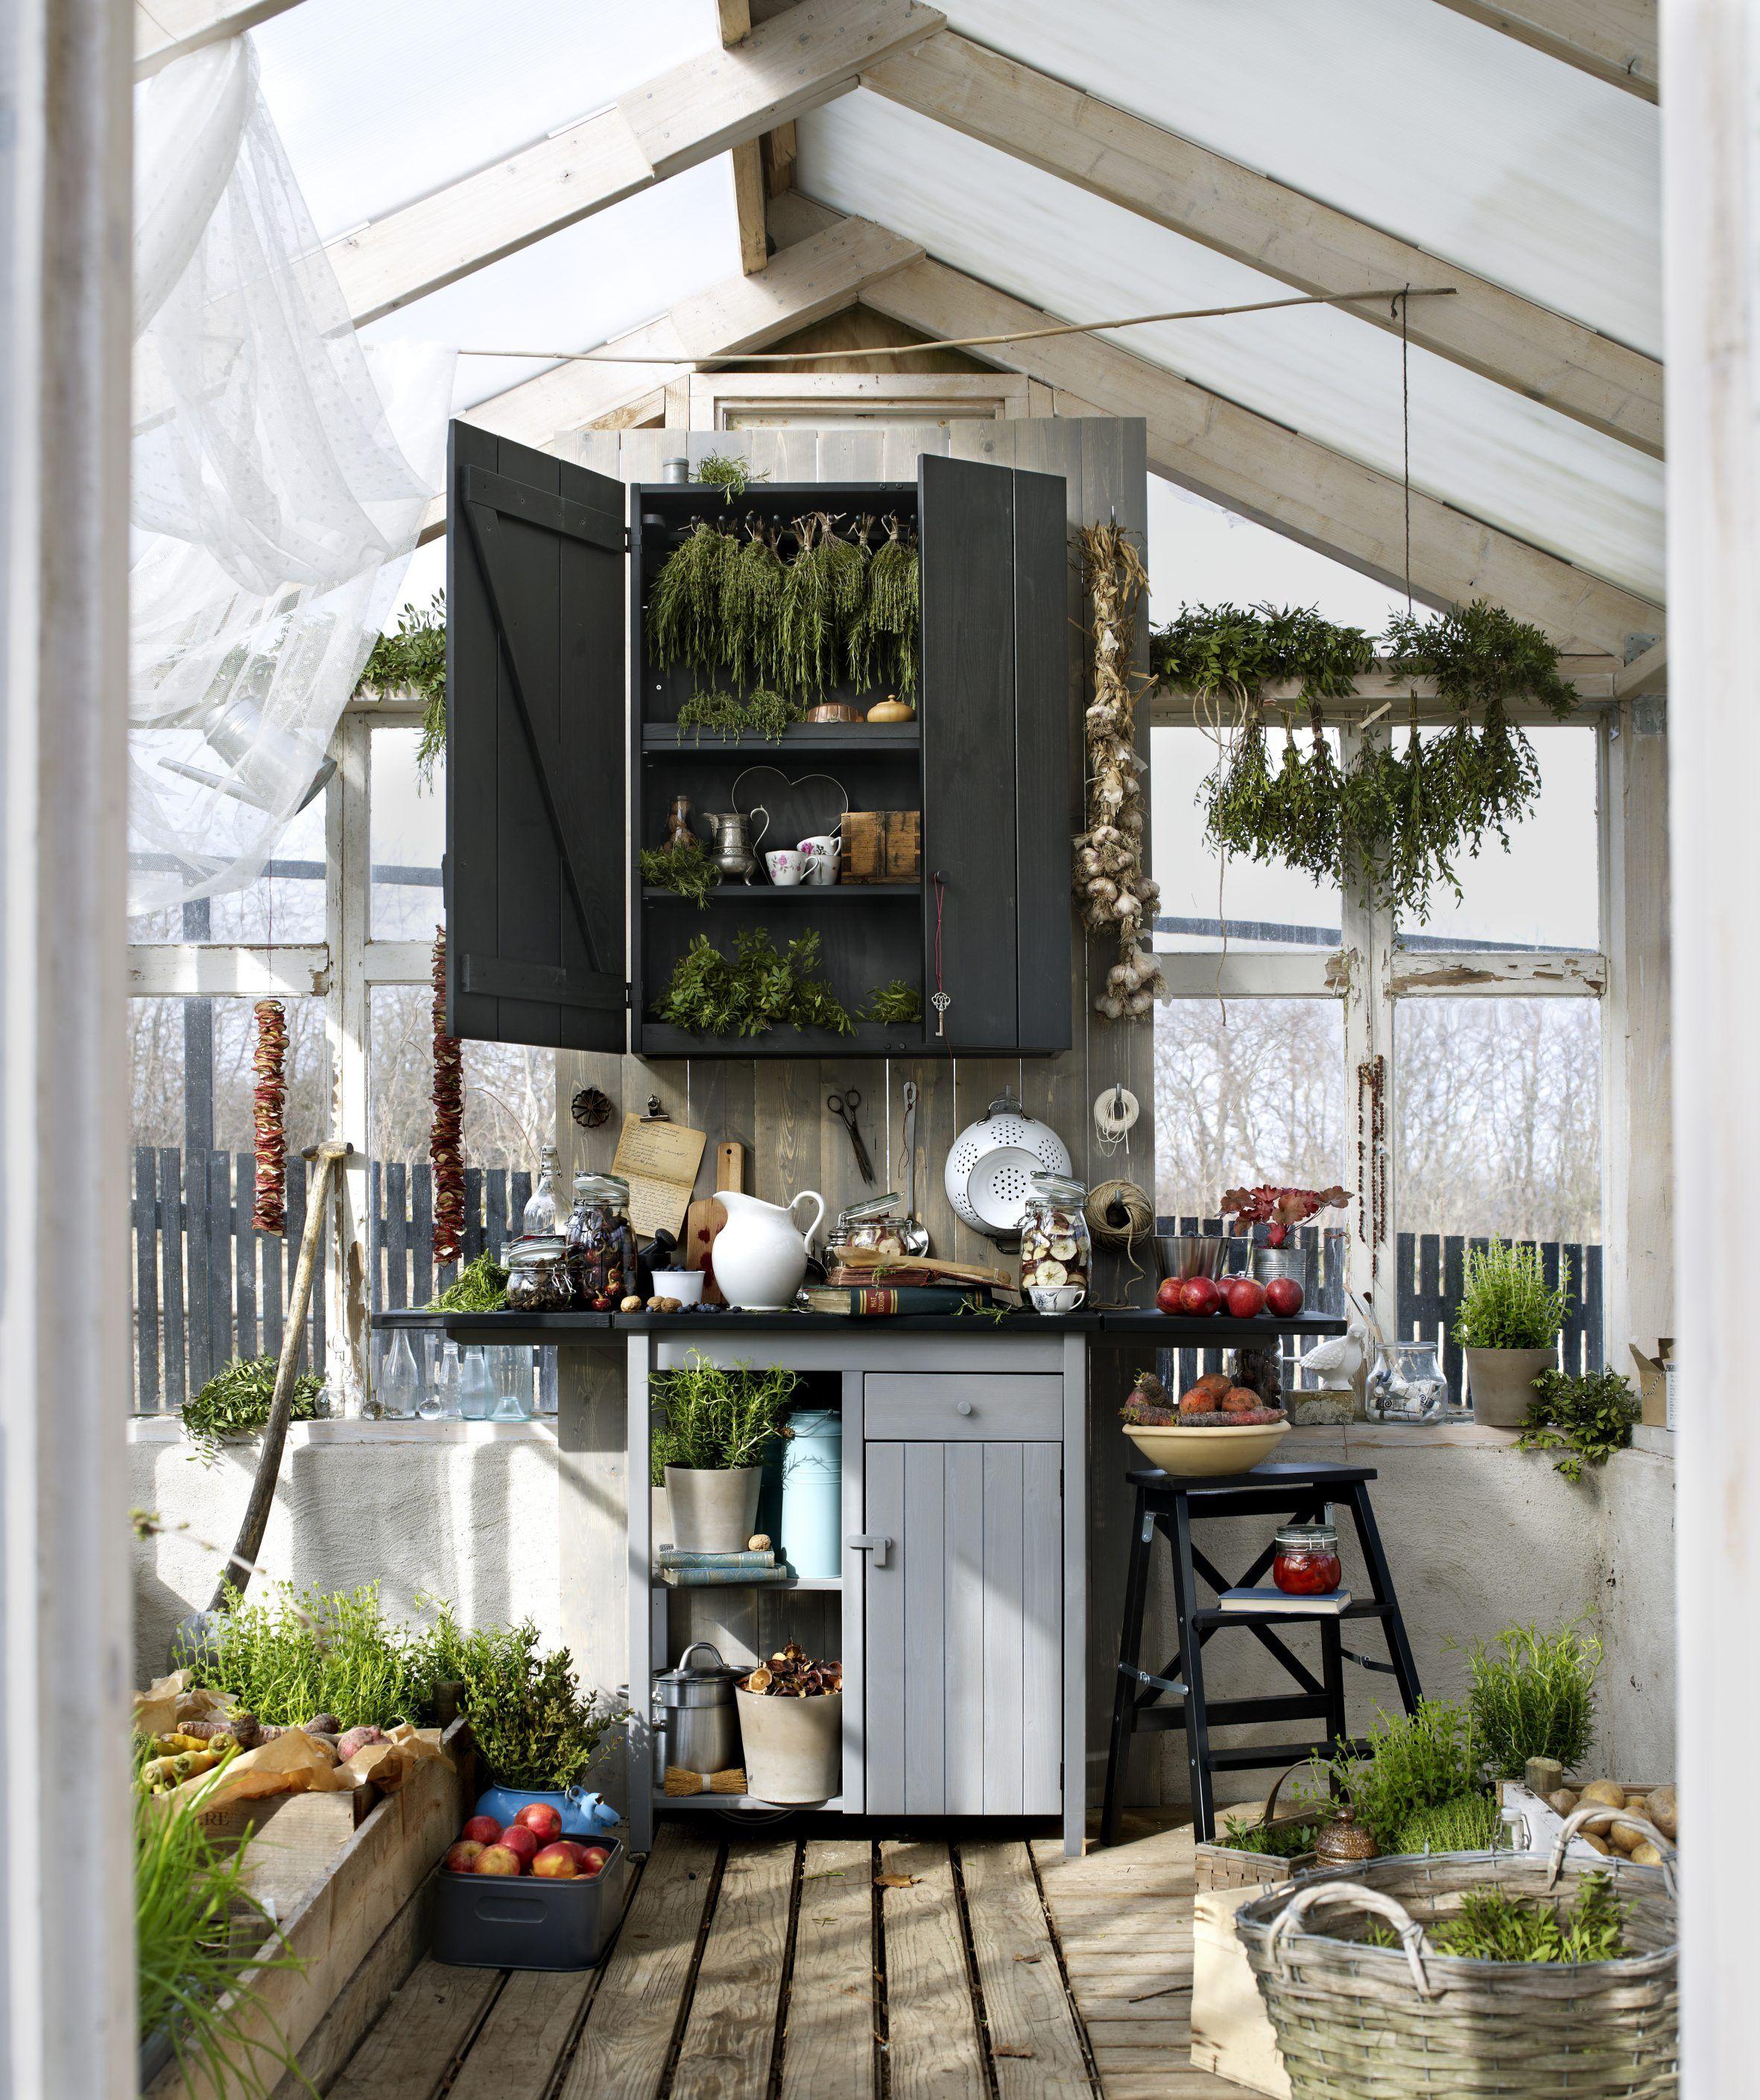 US Furniture and Home Furnishings Glashaus, Greenhaus